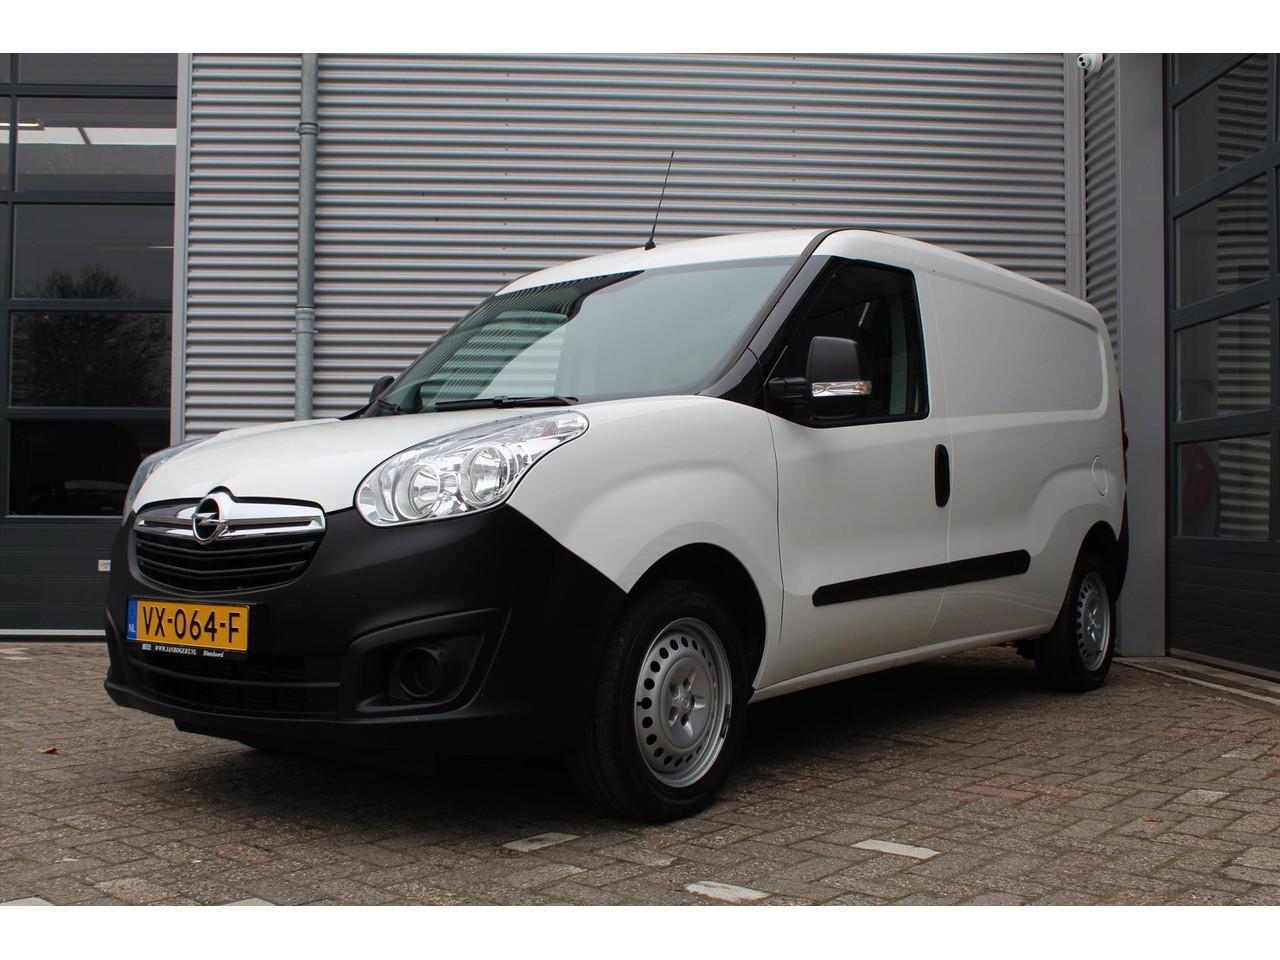 Opel Combo 1.3 cdti 90pk l2h1 edition executive [ airco+cruise+pdc ]